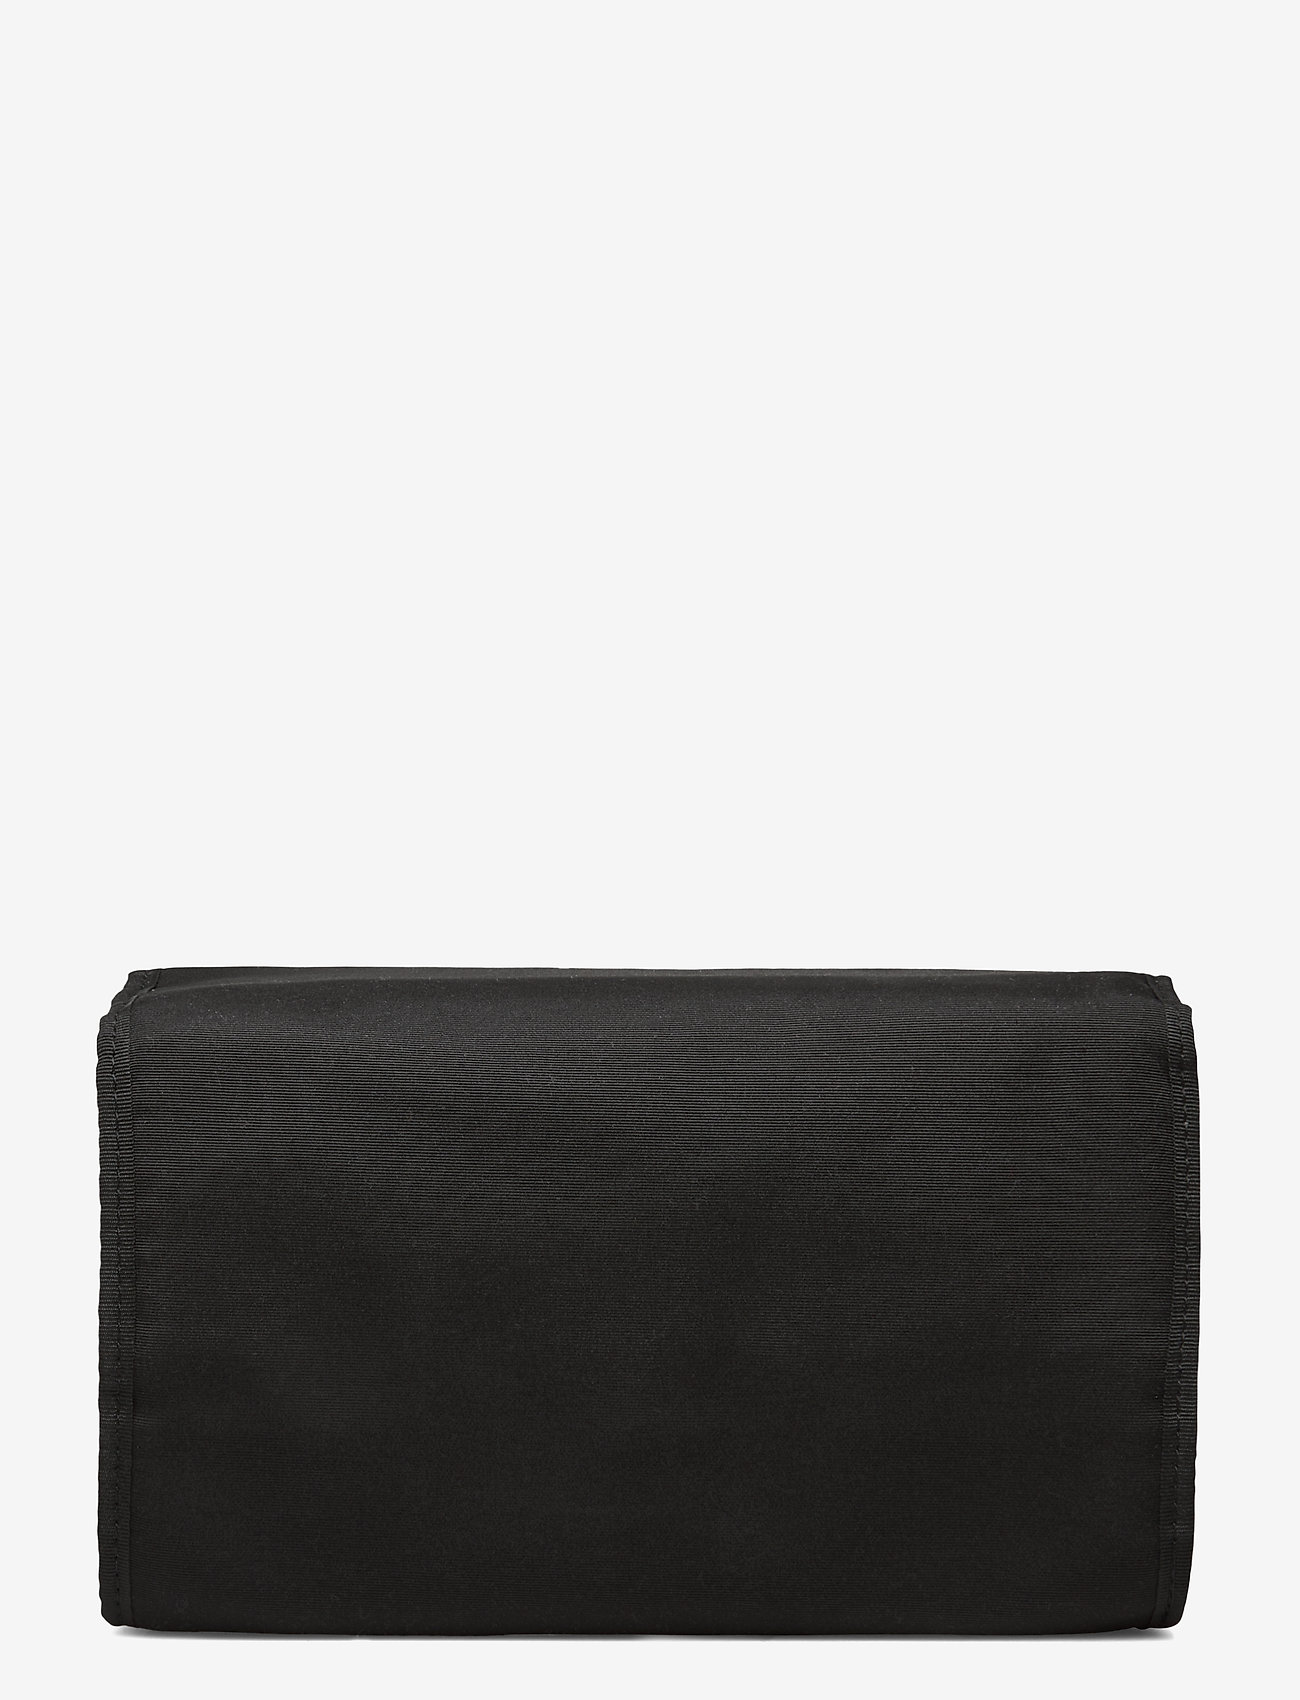 Calvin Klein Ck United Travel Washbag - Bags